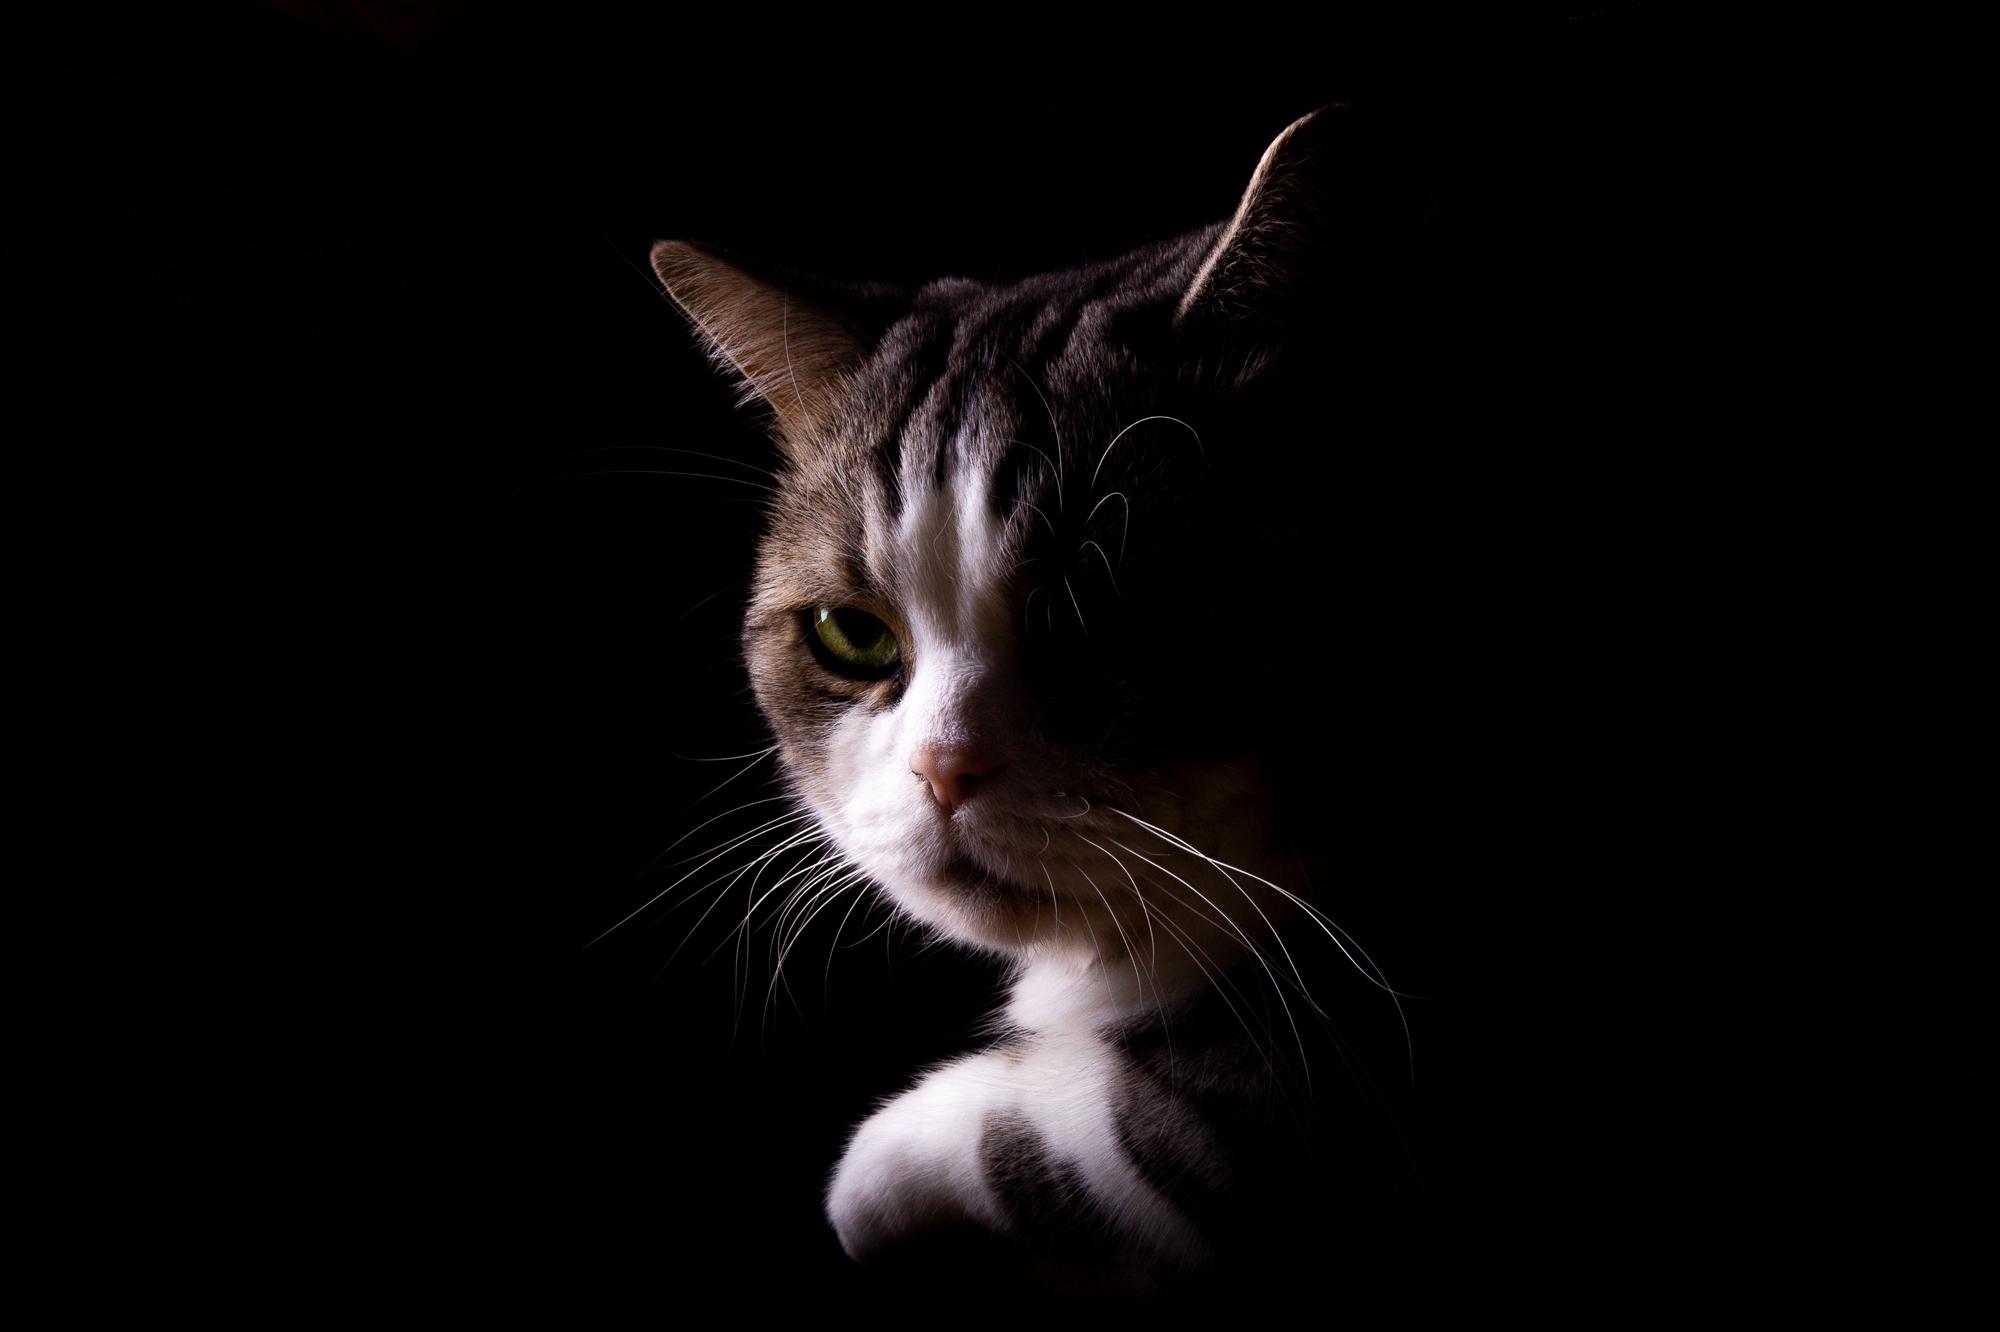 ollo / Hungrige Katze